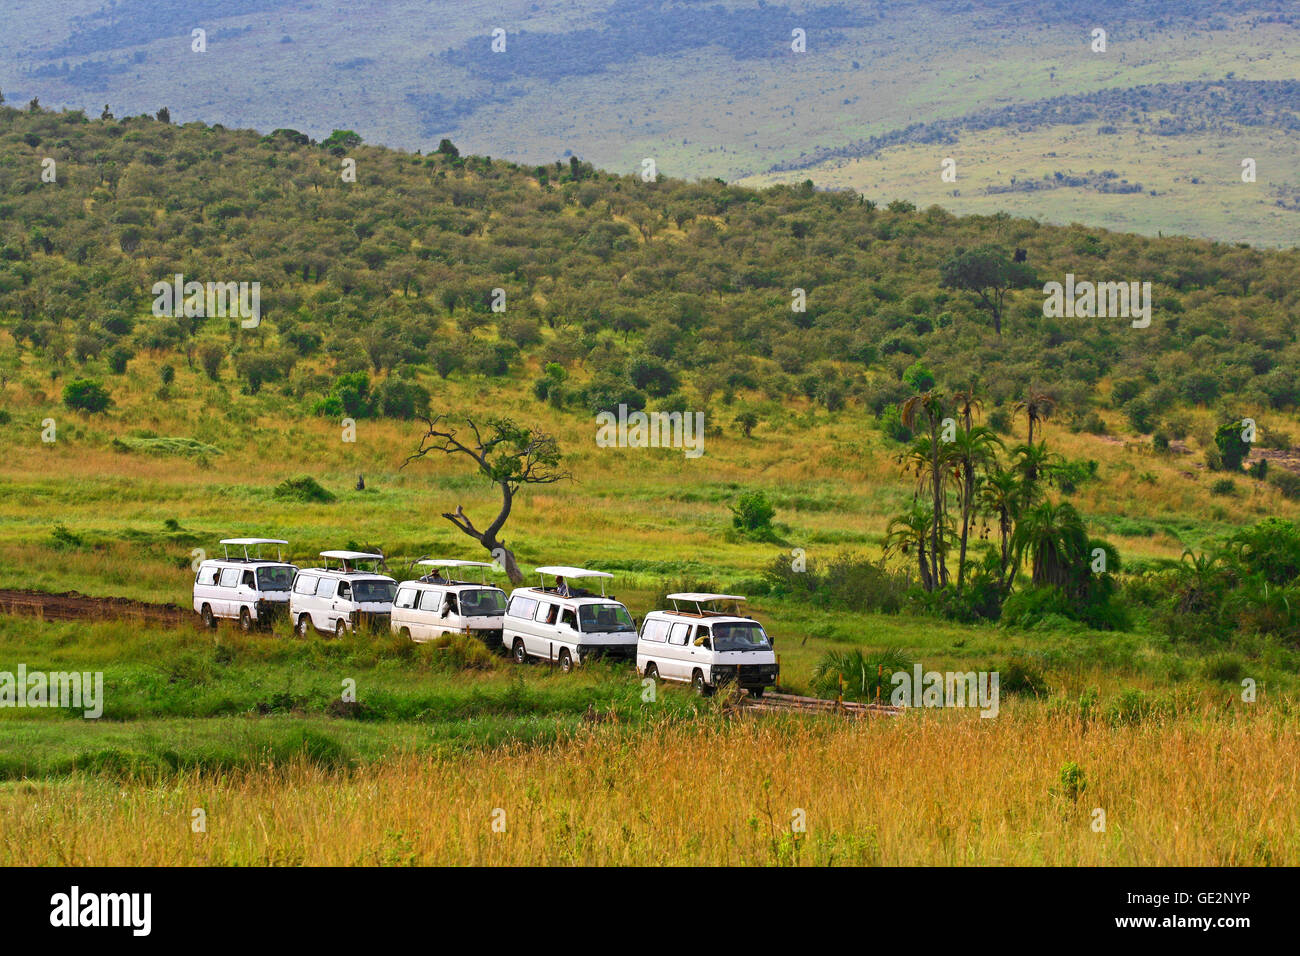 People watching animals from vehicles during safari game drive in Maasai Mara National Reserve. - Stock Image